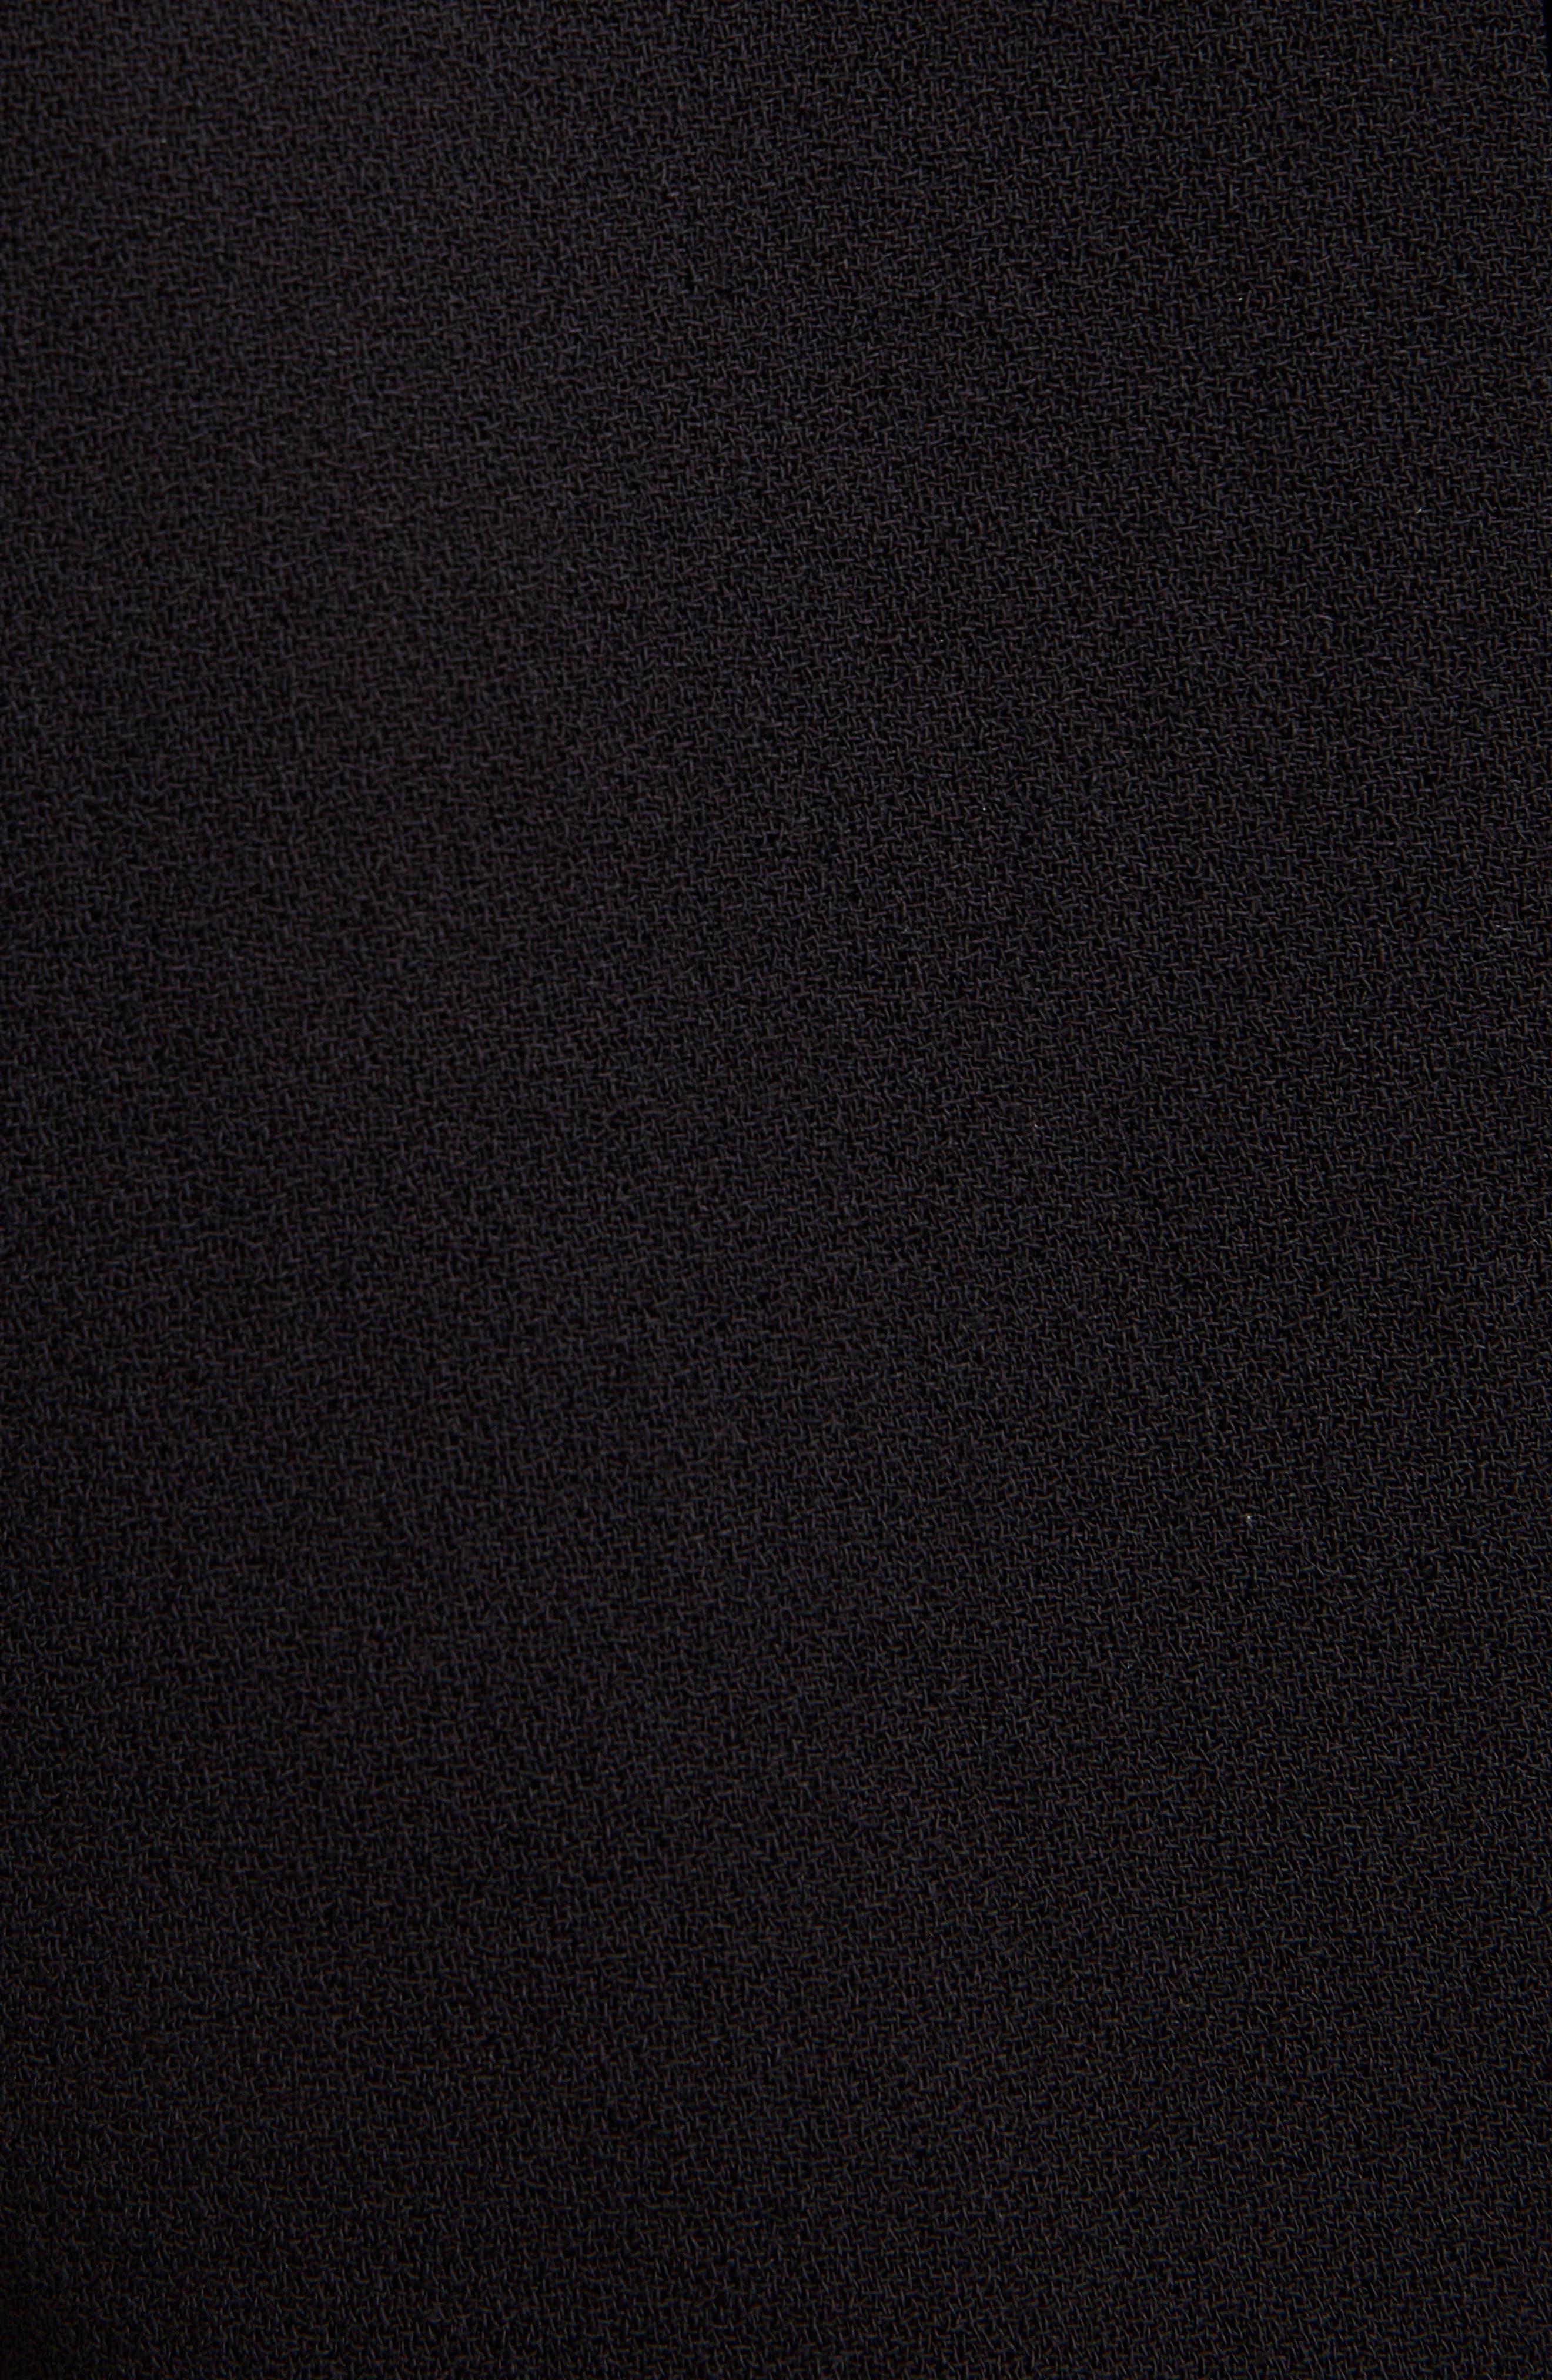 Lace Illusion Dress,                             Alternate thumbnail 5, color,                             001-BLACK